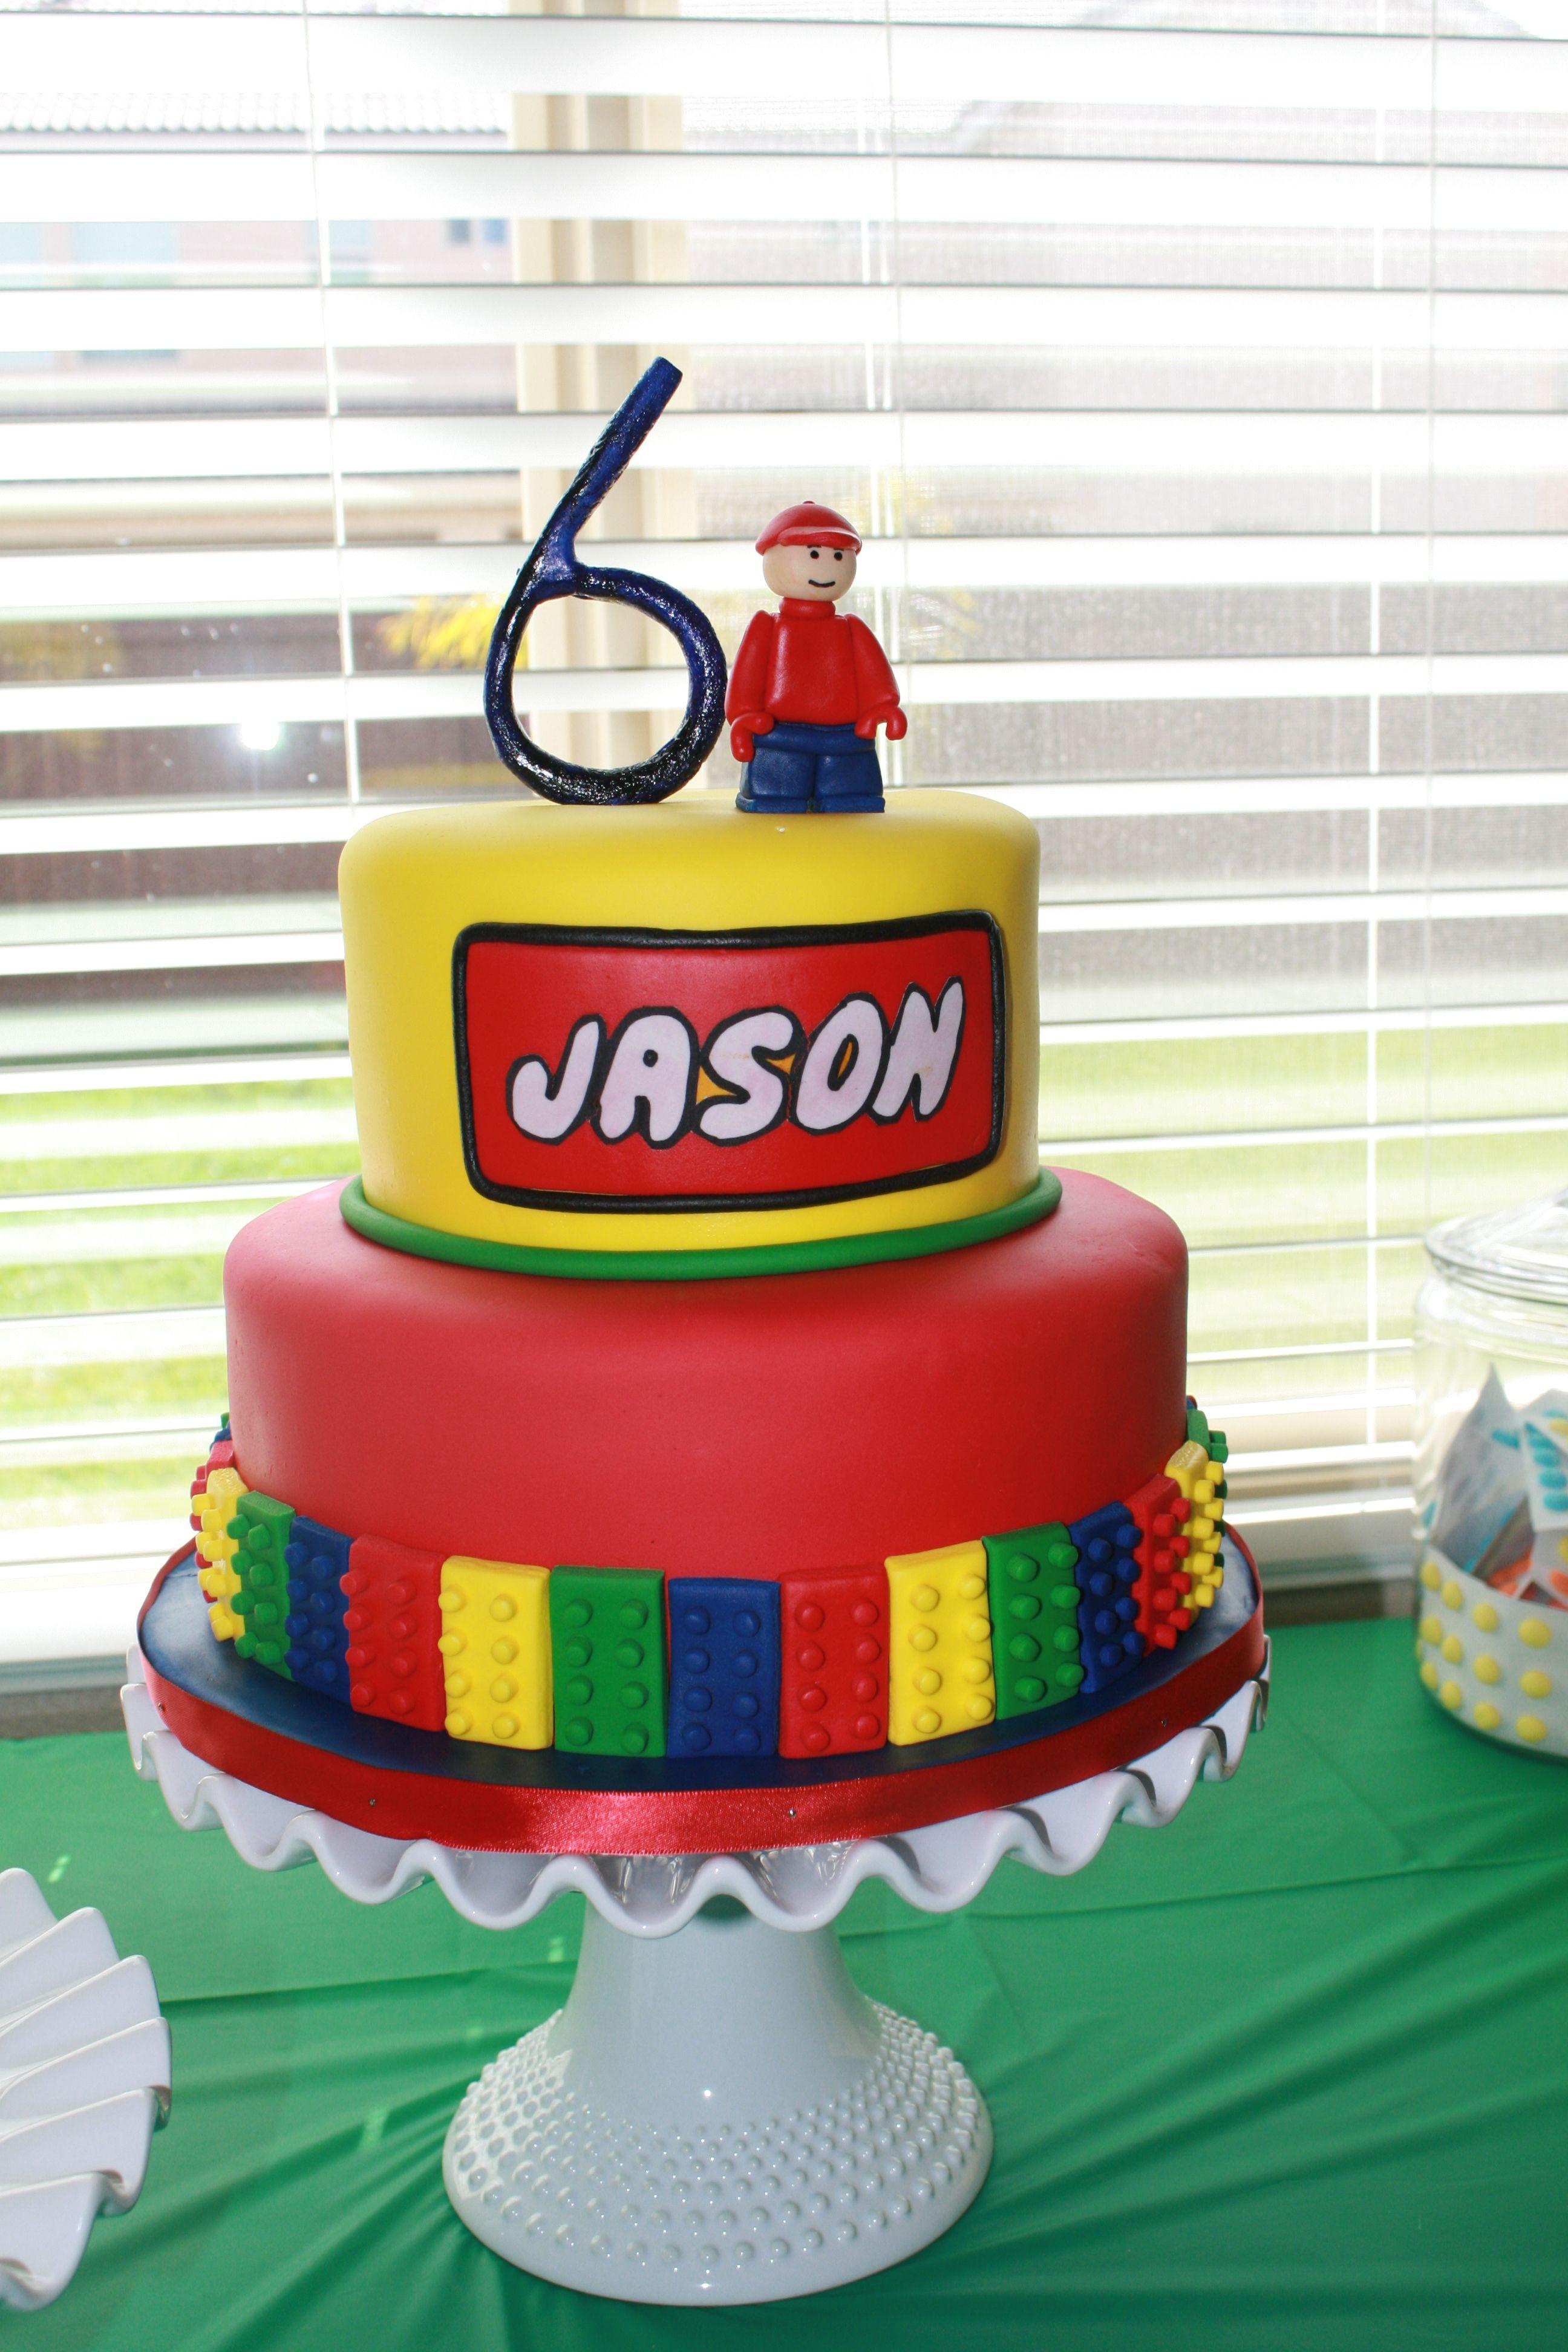 Swell Very Cool Lego Cake For A Little Boys Bday Party Lego Birthday Funny Birthday Cards Online Elaedamsfinfo